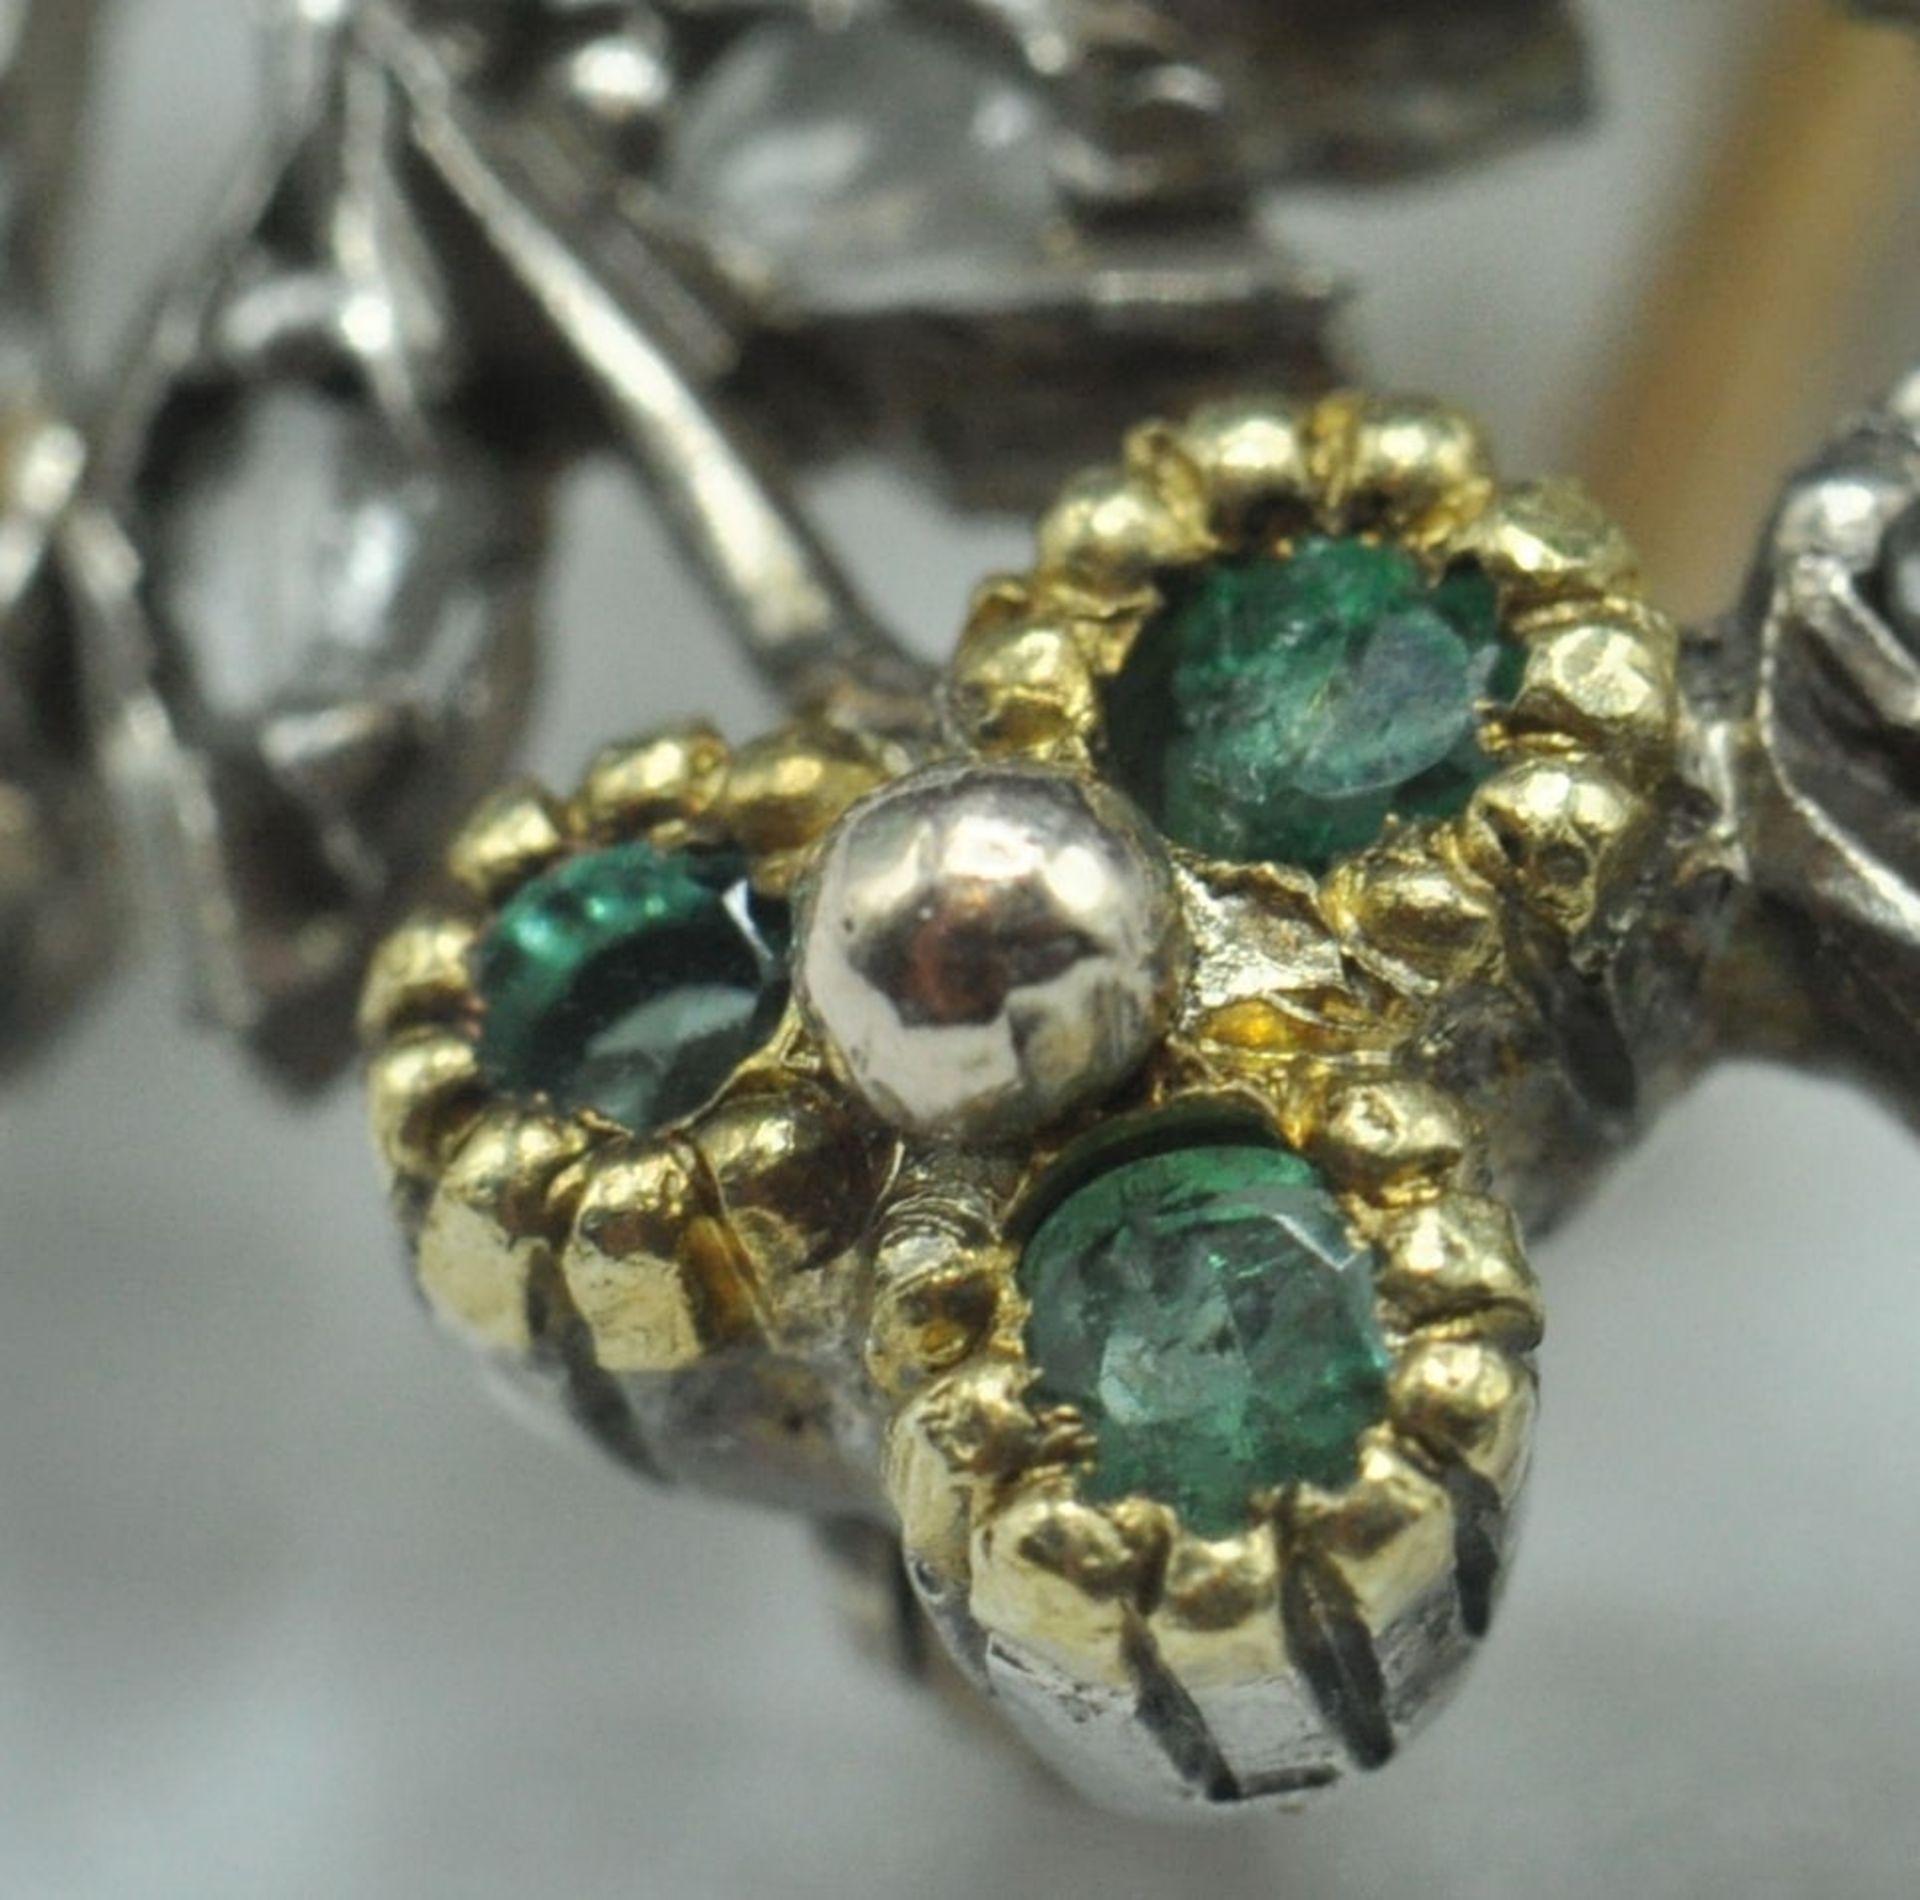 18ct White & Yellow Gold Emerald & Diamond Jardiniere Brooch - Image 6 of 9